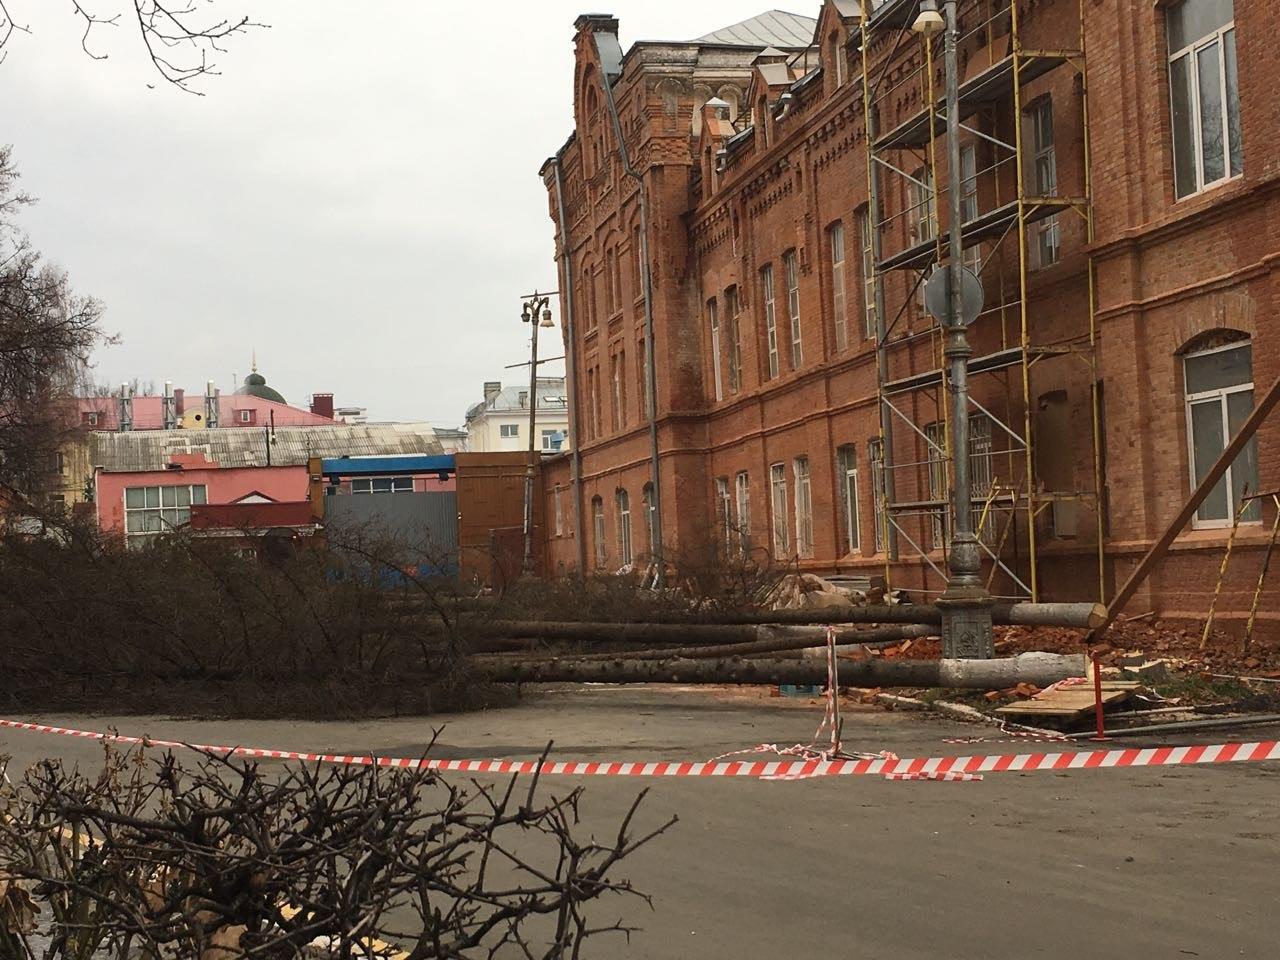 В центре Брянска на бульваре Гагарина реконструируют памятник архитектуры конца XIX века